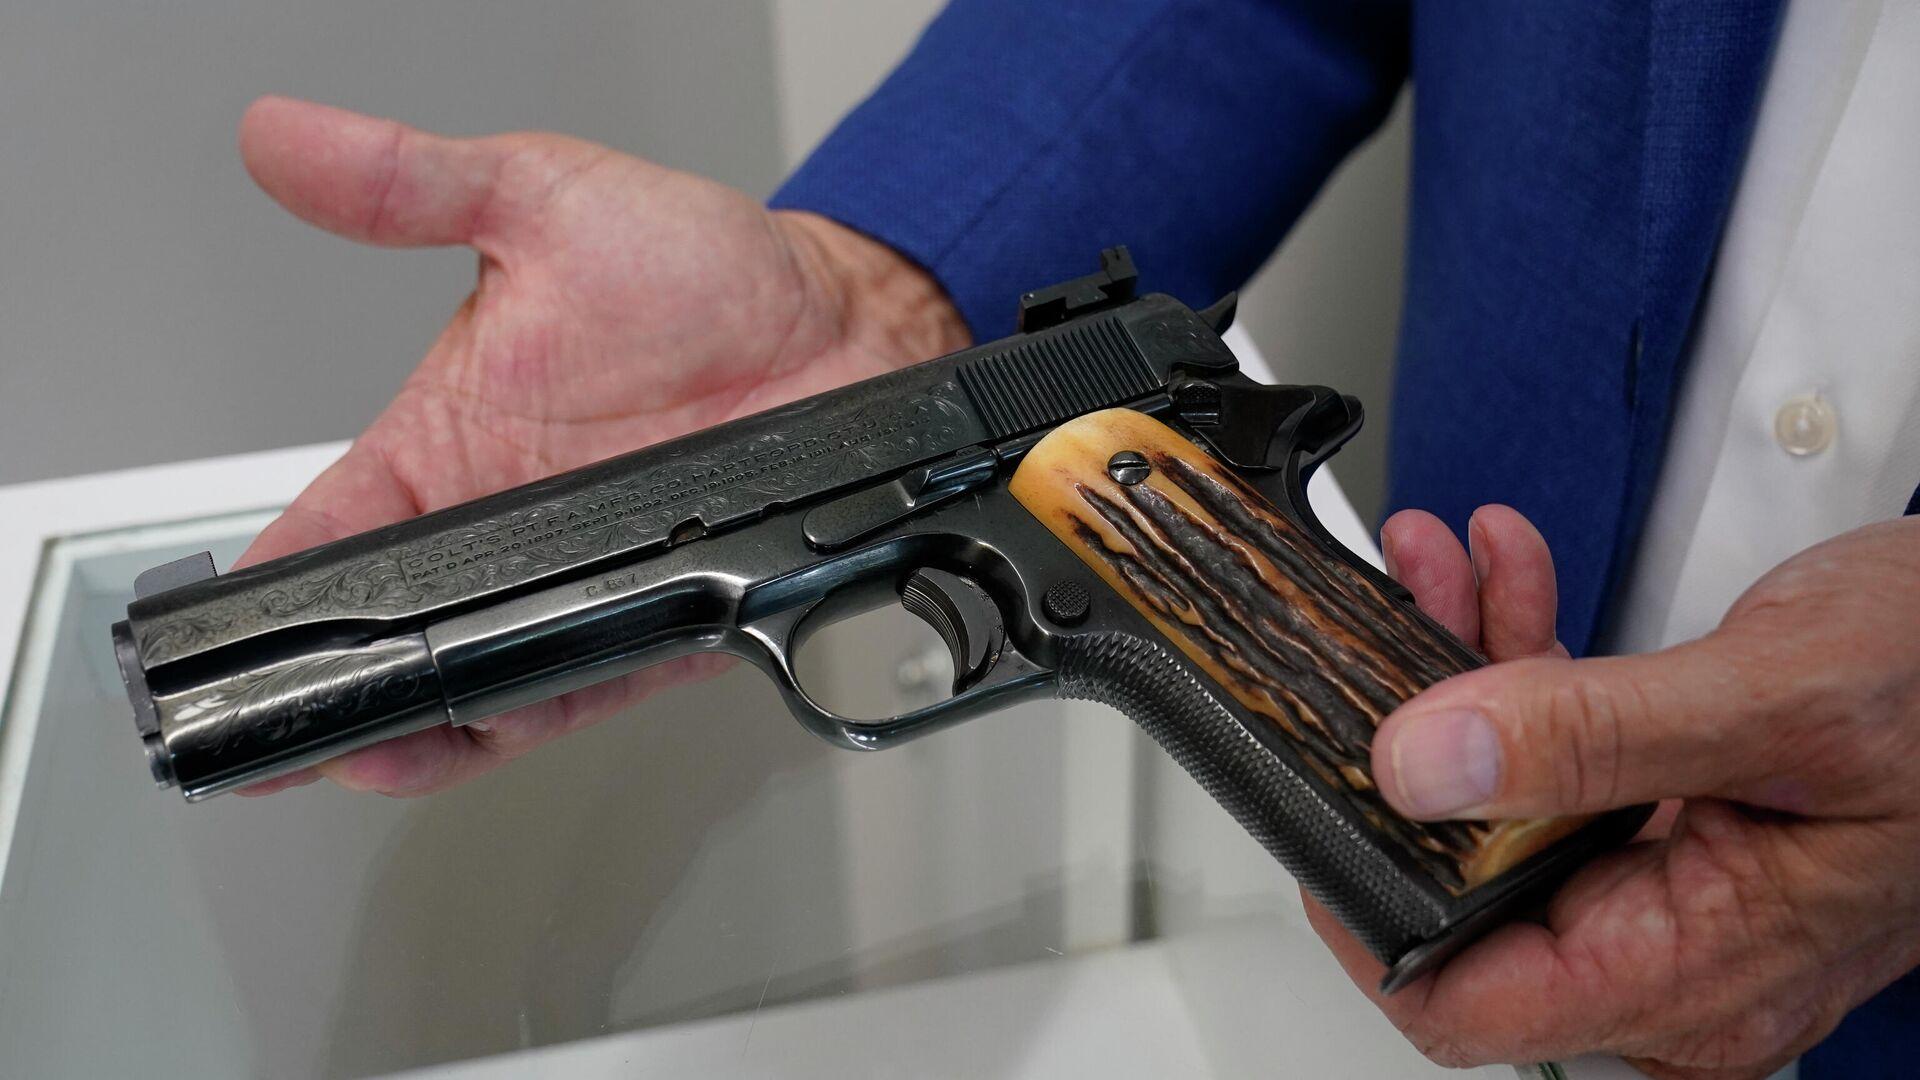 Pistola Colt calibre .45 de Al Capone - Sputnik Mundo, 1920, 27.08.2021